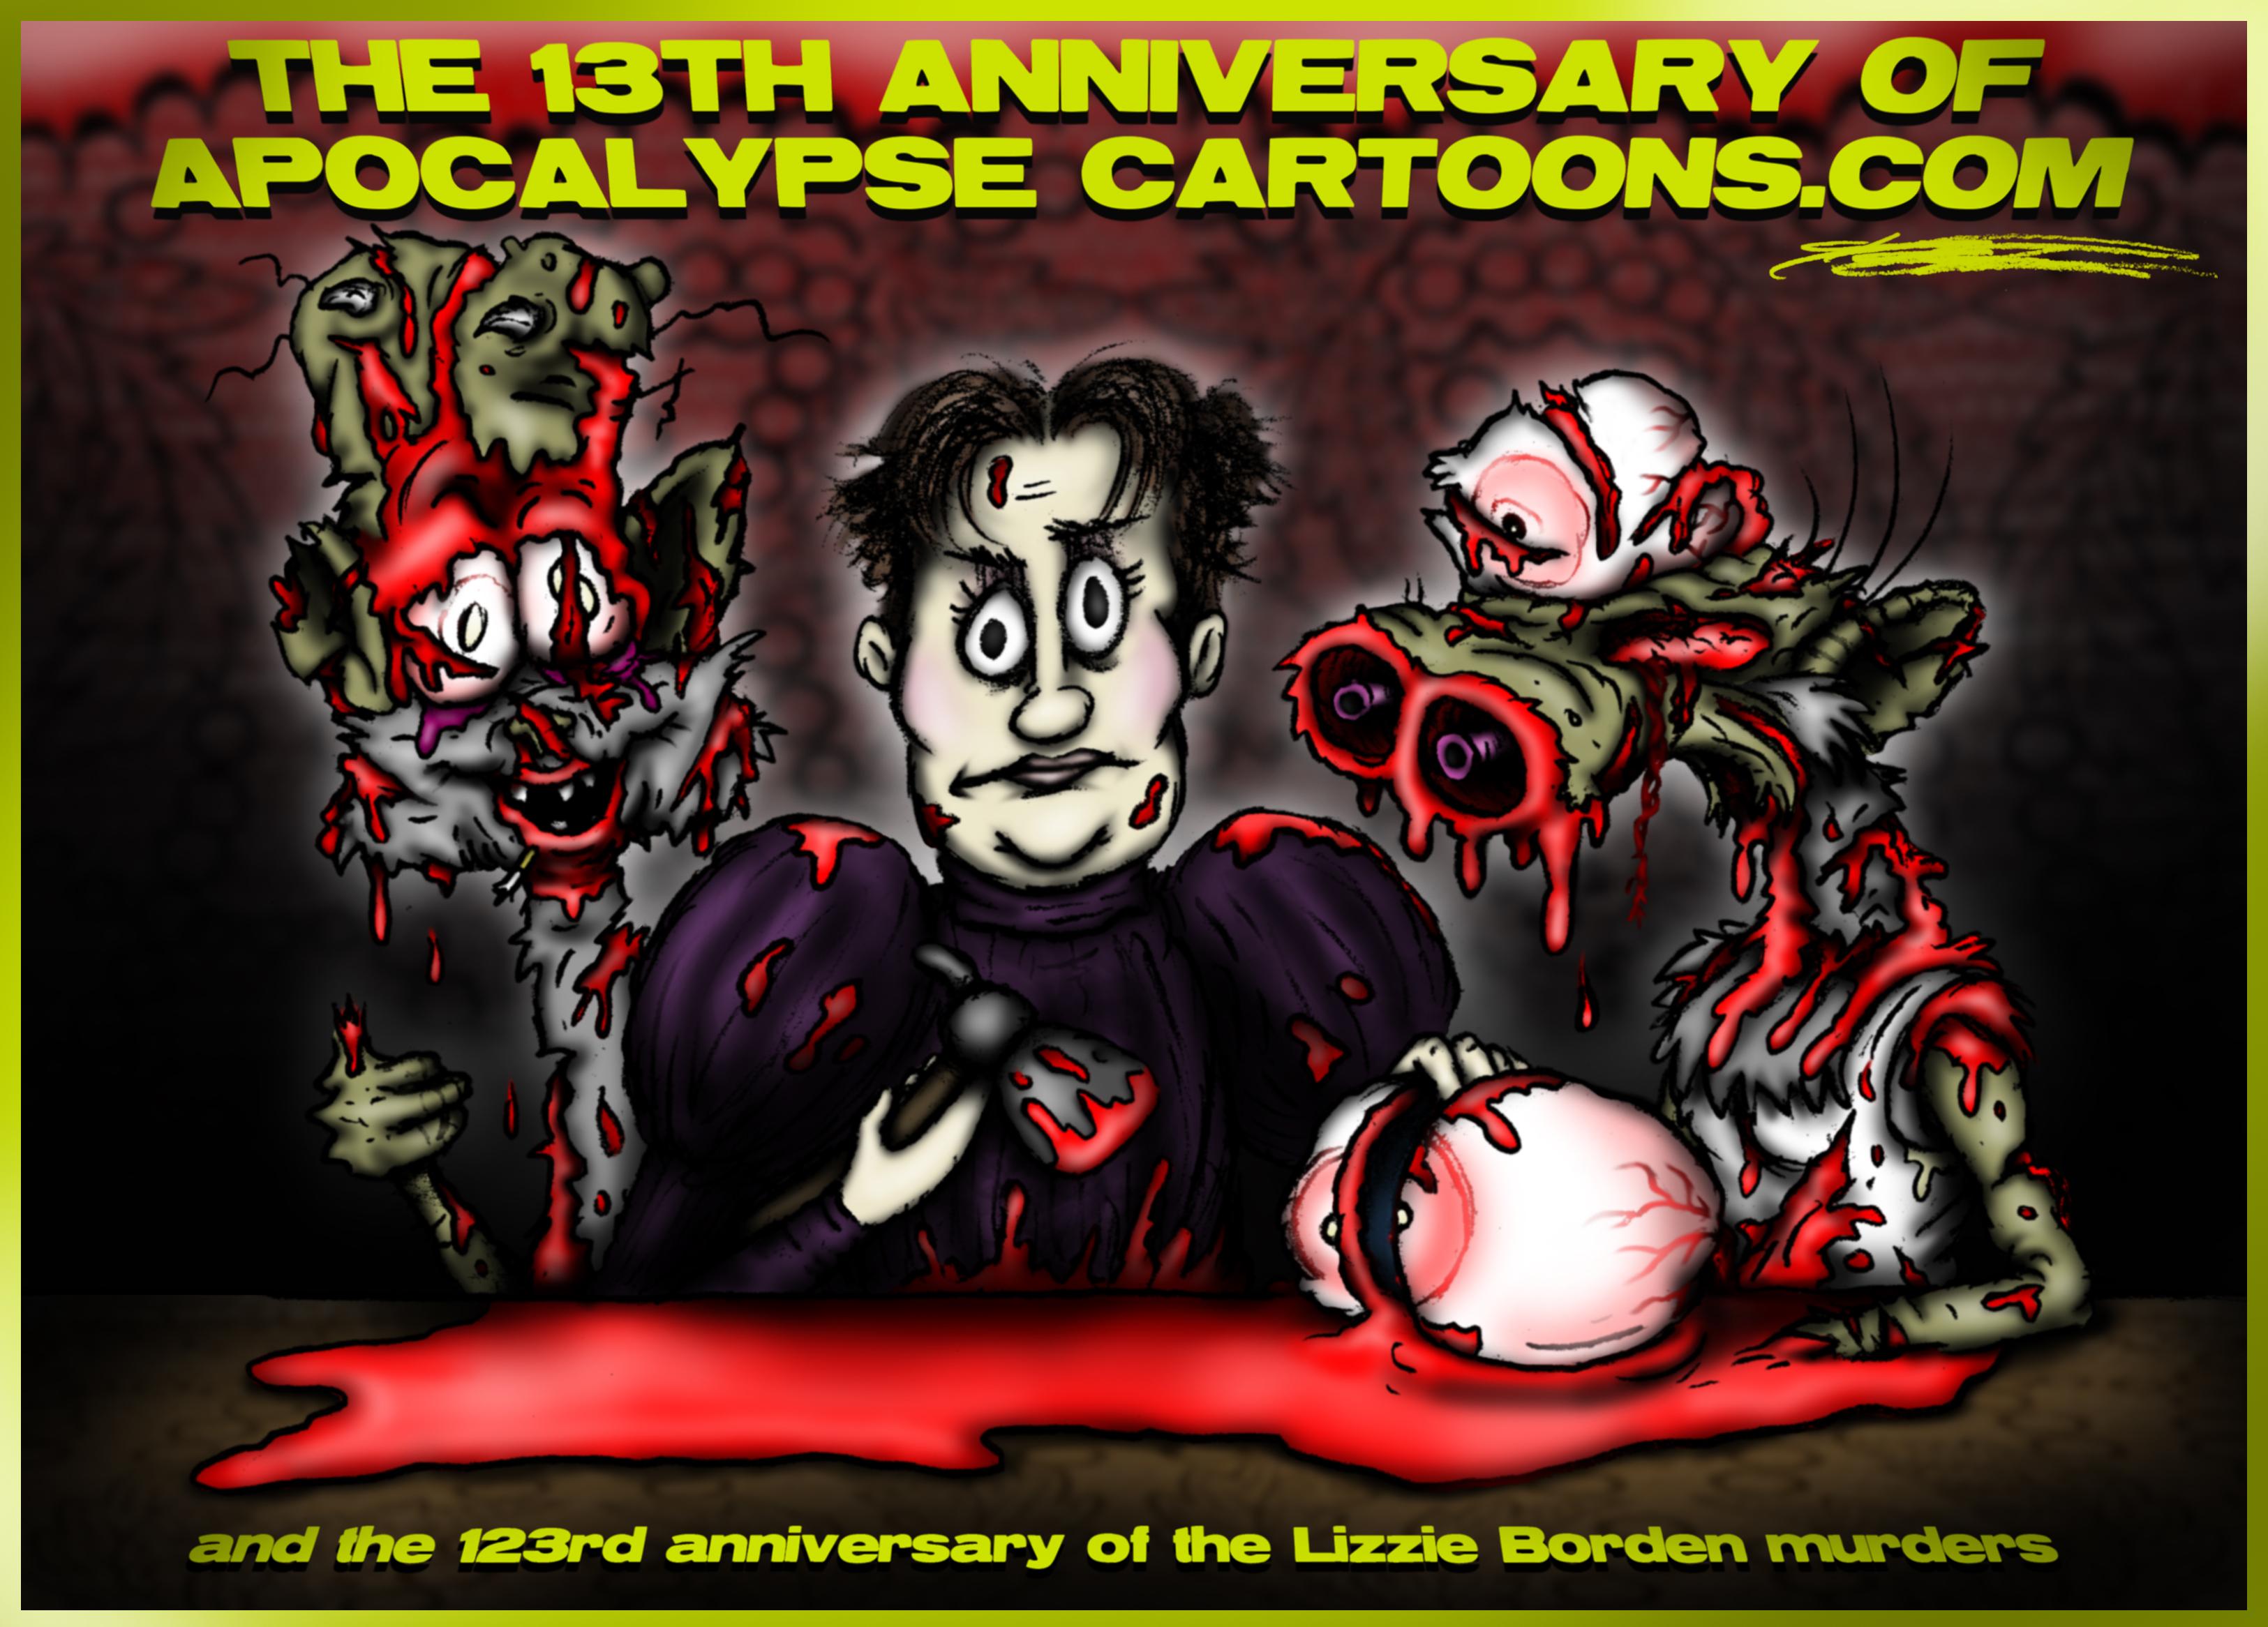 The 13th Anniversary of Apocalypse Cartoons